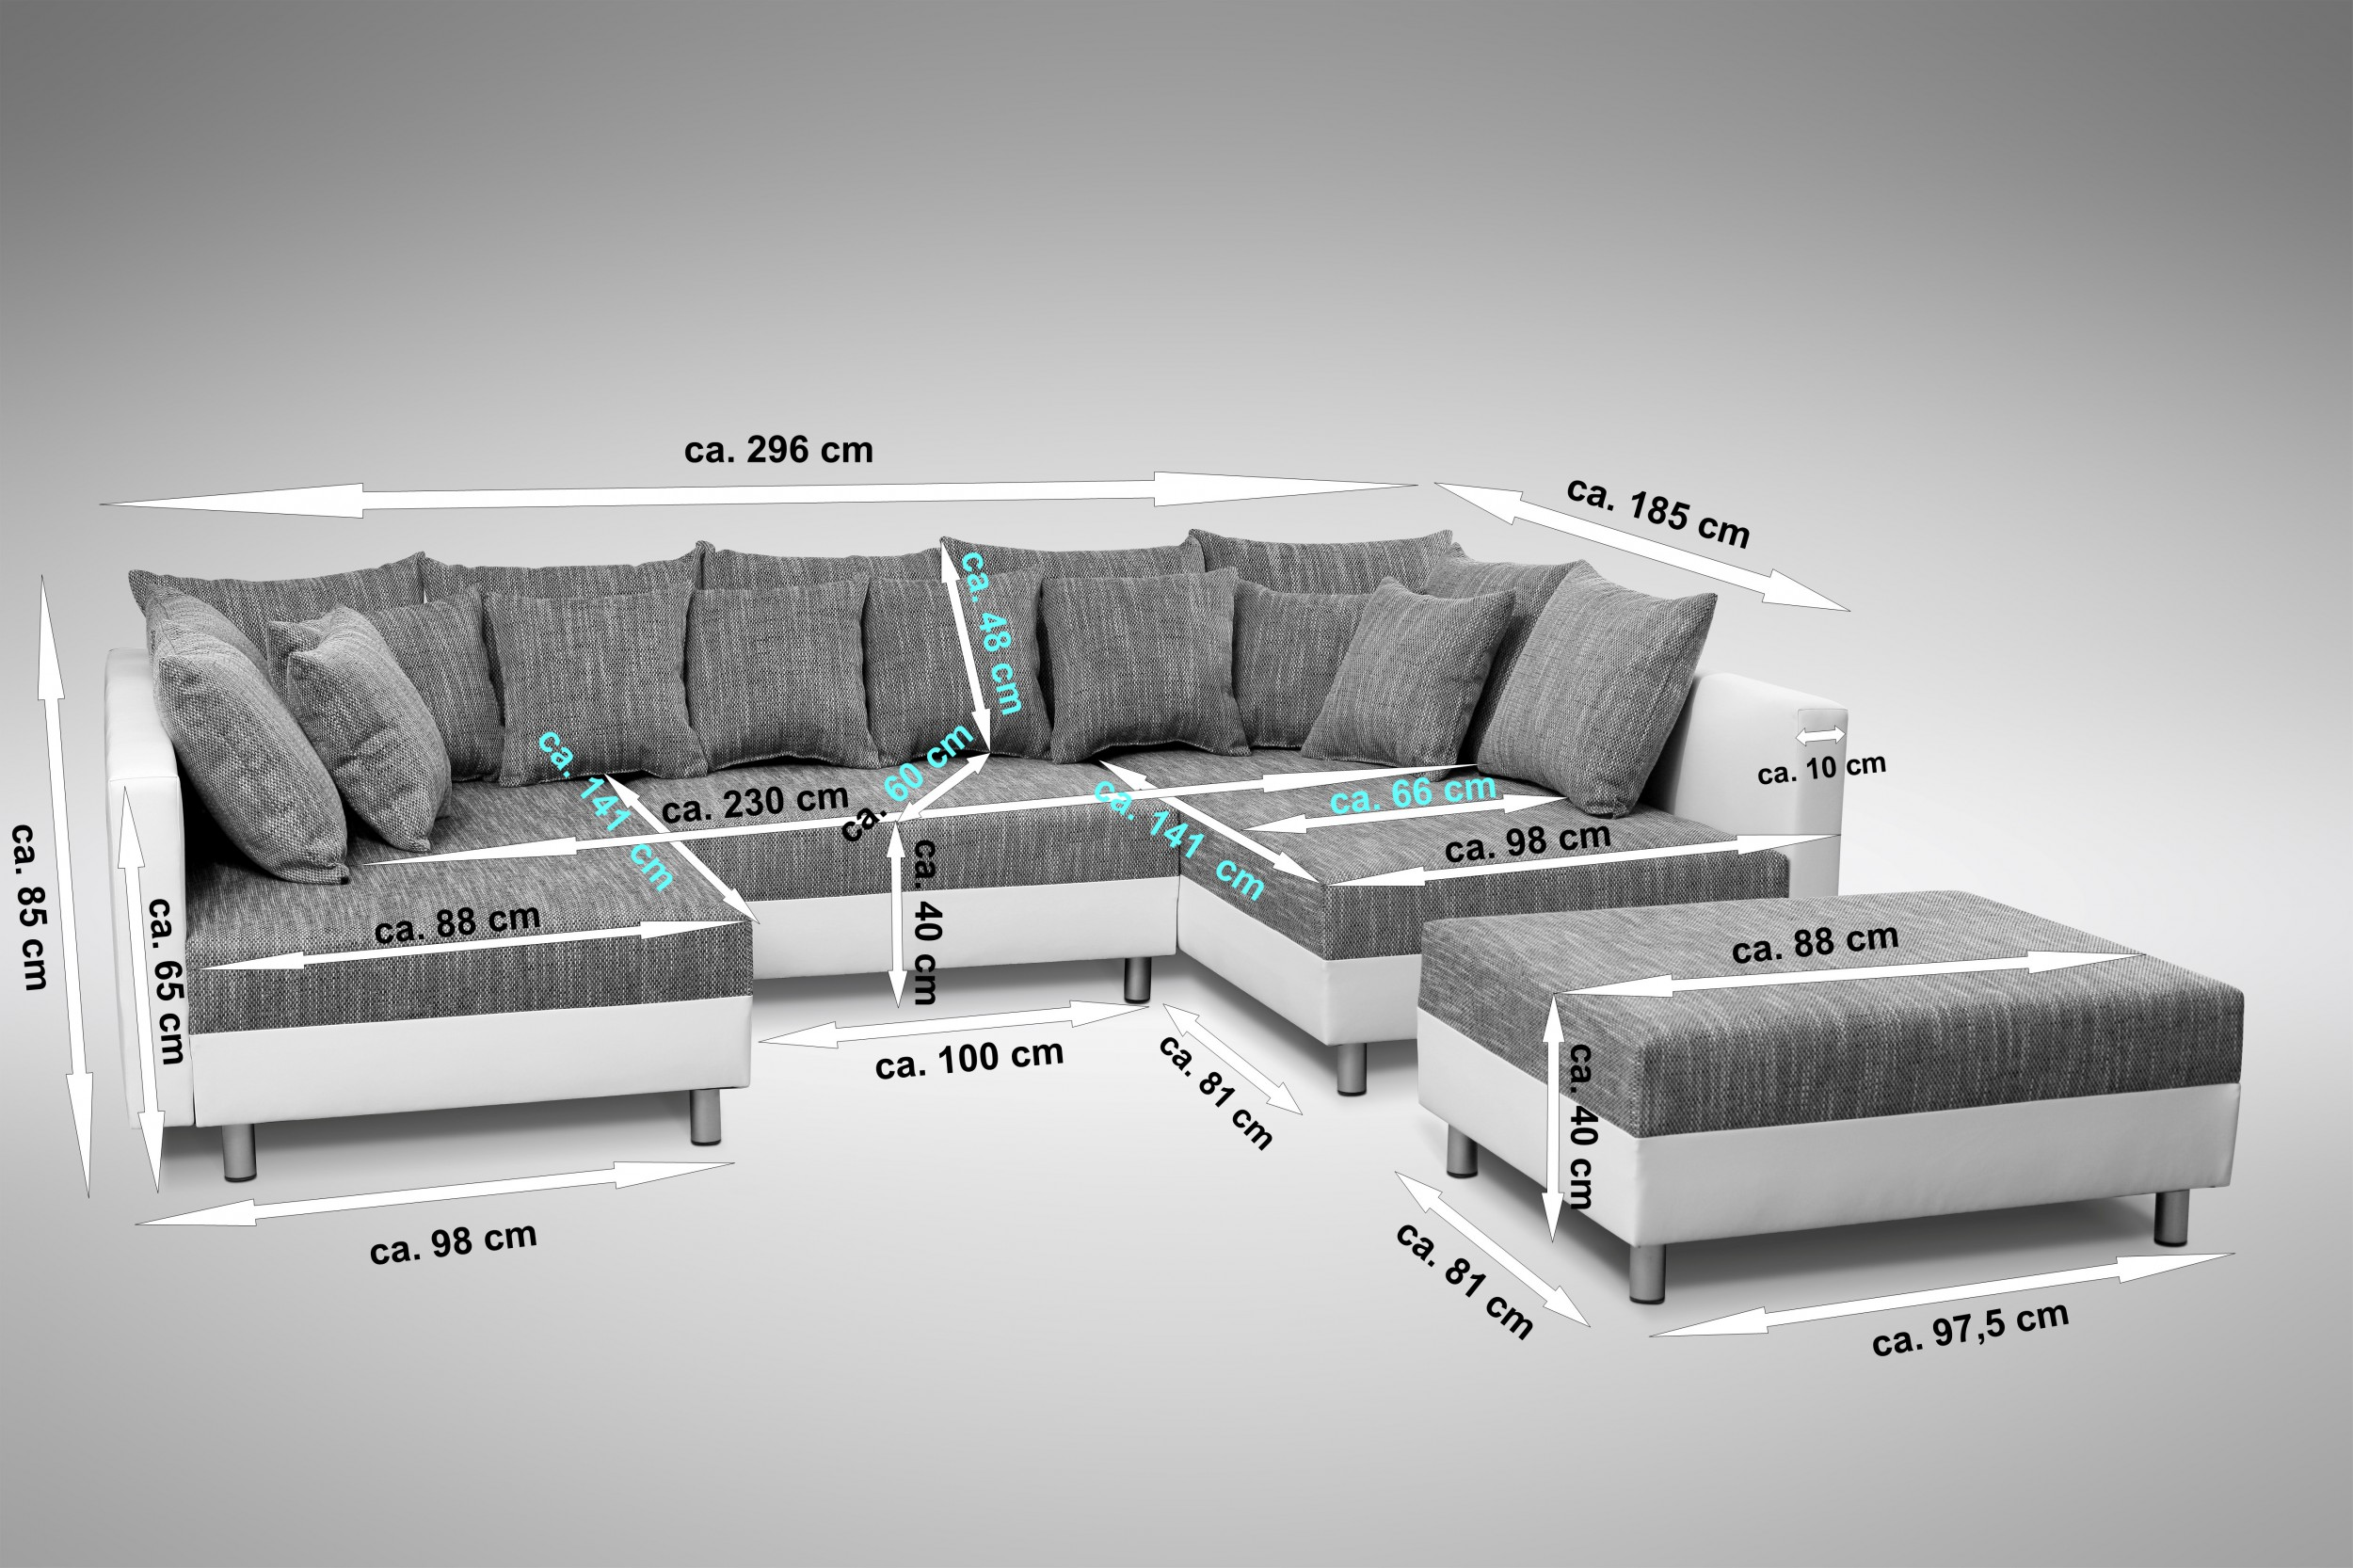 sofa couch ecksofa eckcouch in weiss hellgrau eckcouch mit hocker minsk xxl polsterm bel sofa. Black Bedroom Furniture Sets. Home Design Ideas